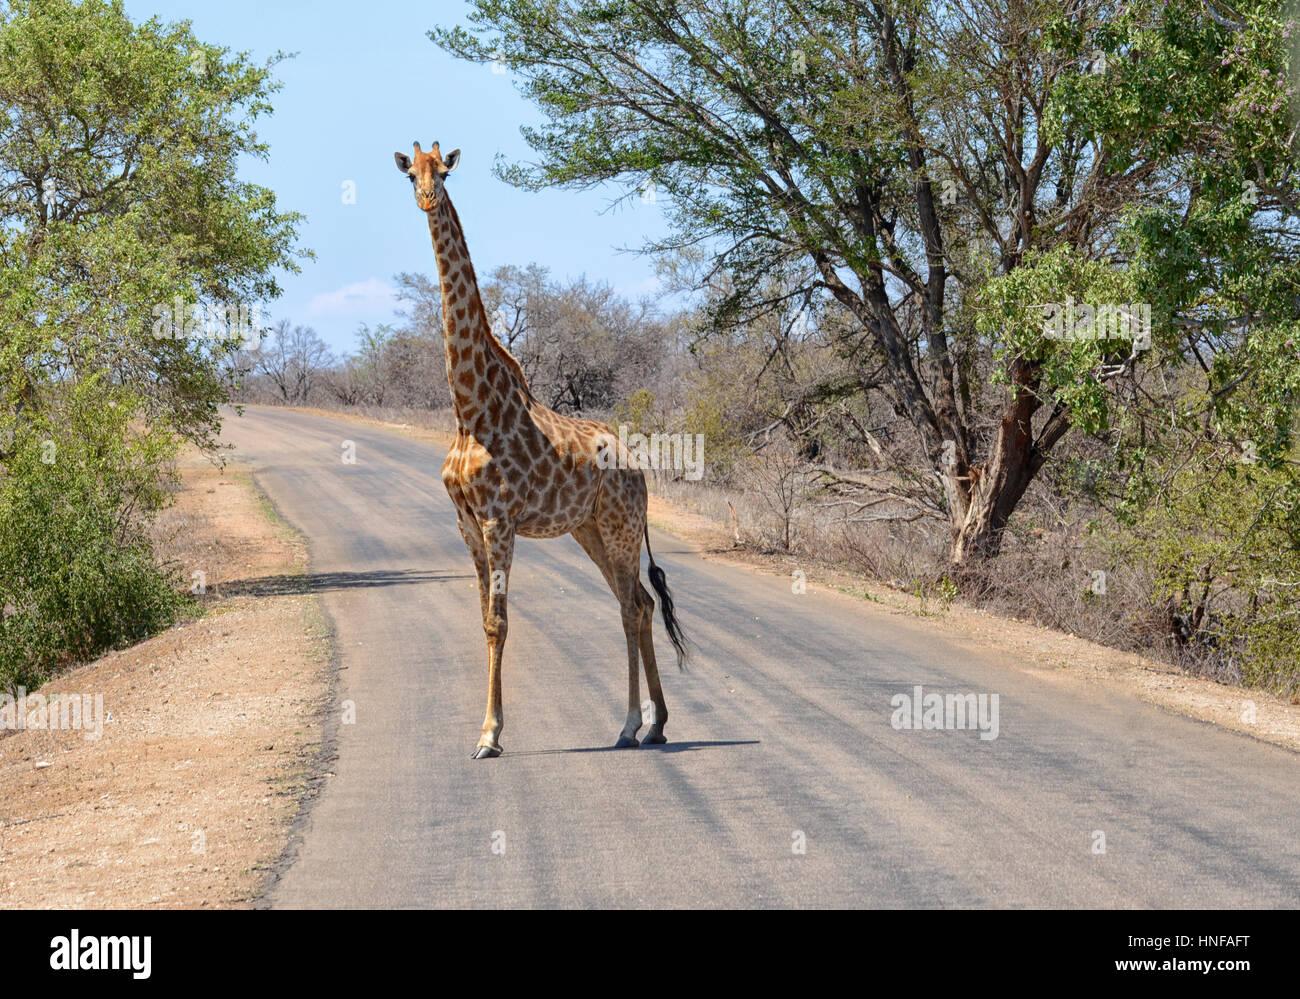 Jirafa en el Parque Nacional Kruger de Sudáfrica caminando a través de una carretera Foto de stock